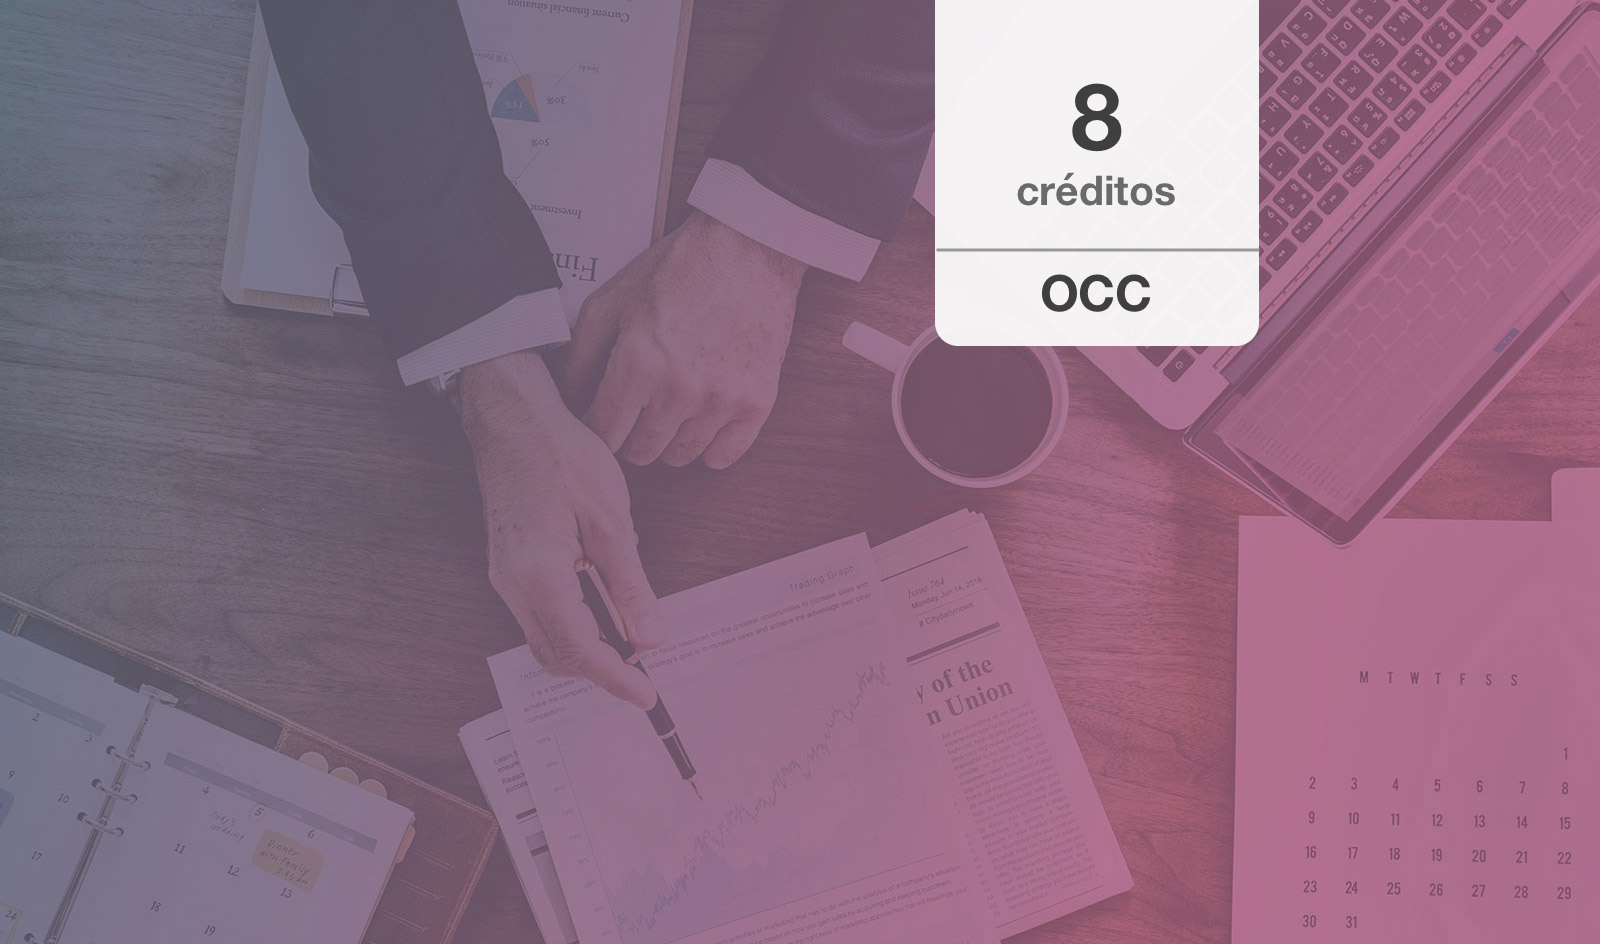 Contabilidade 8 creditos